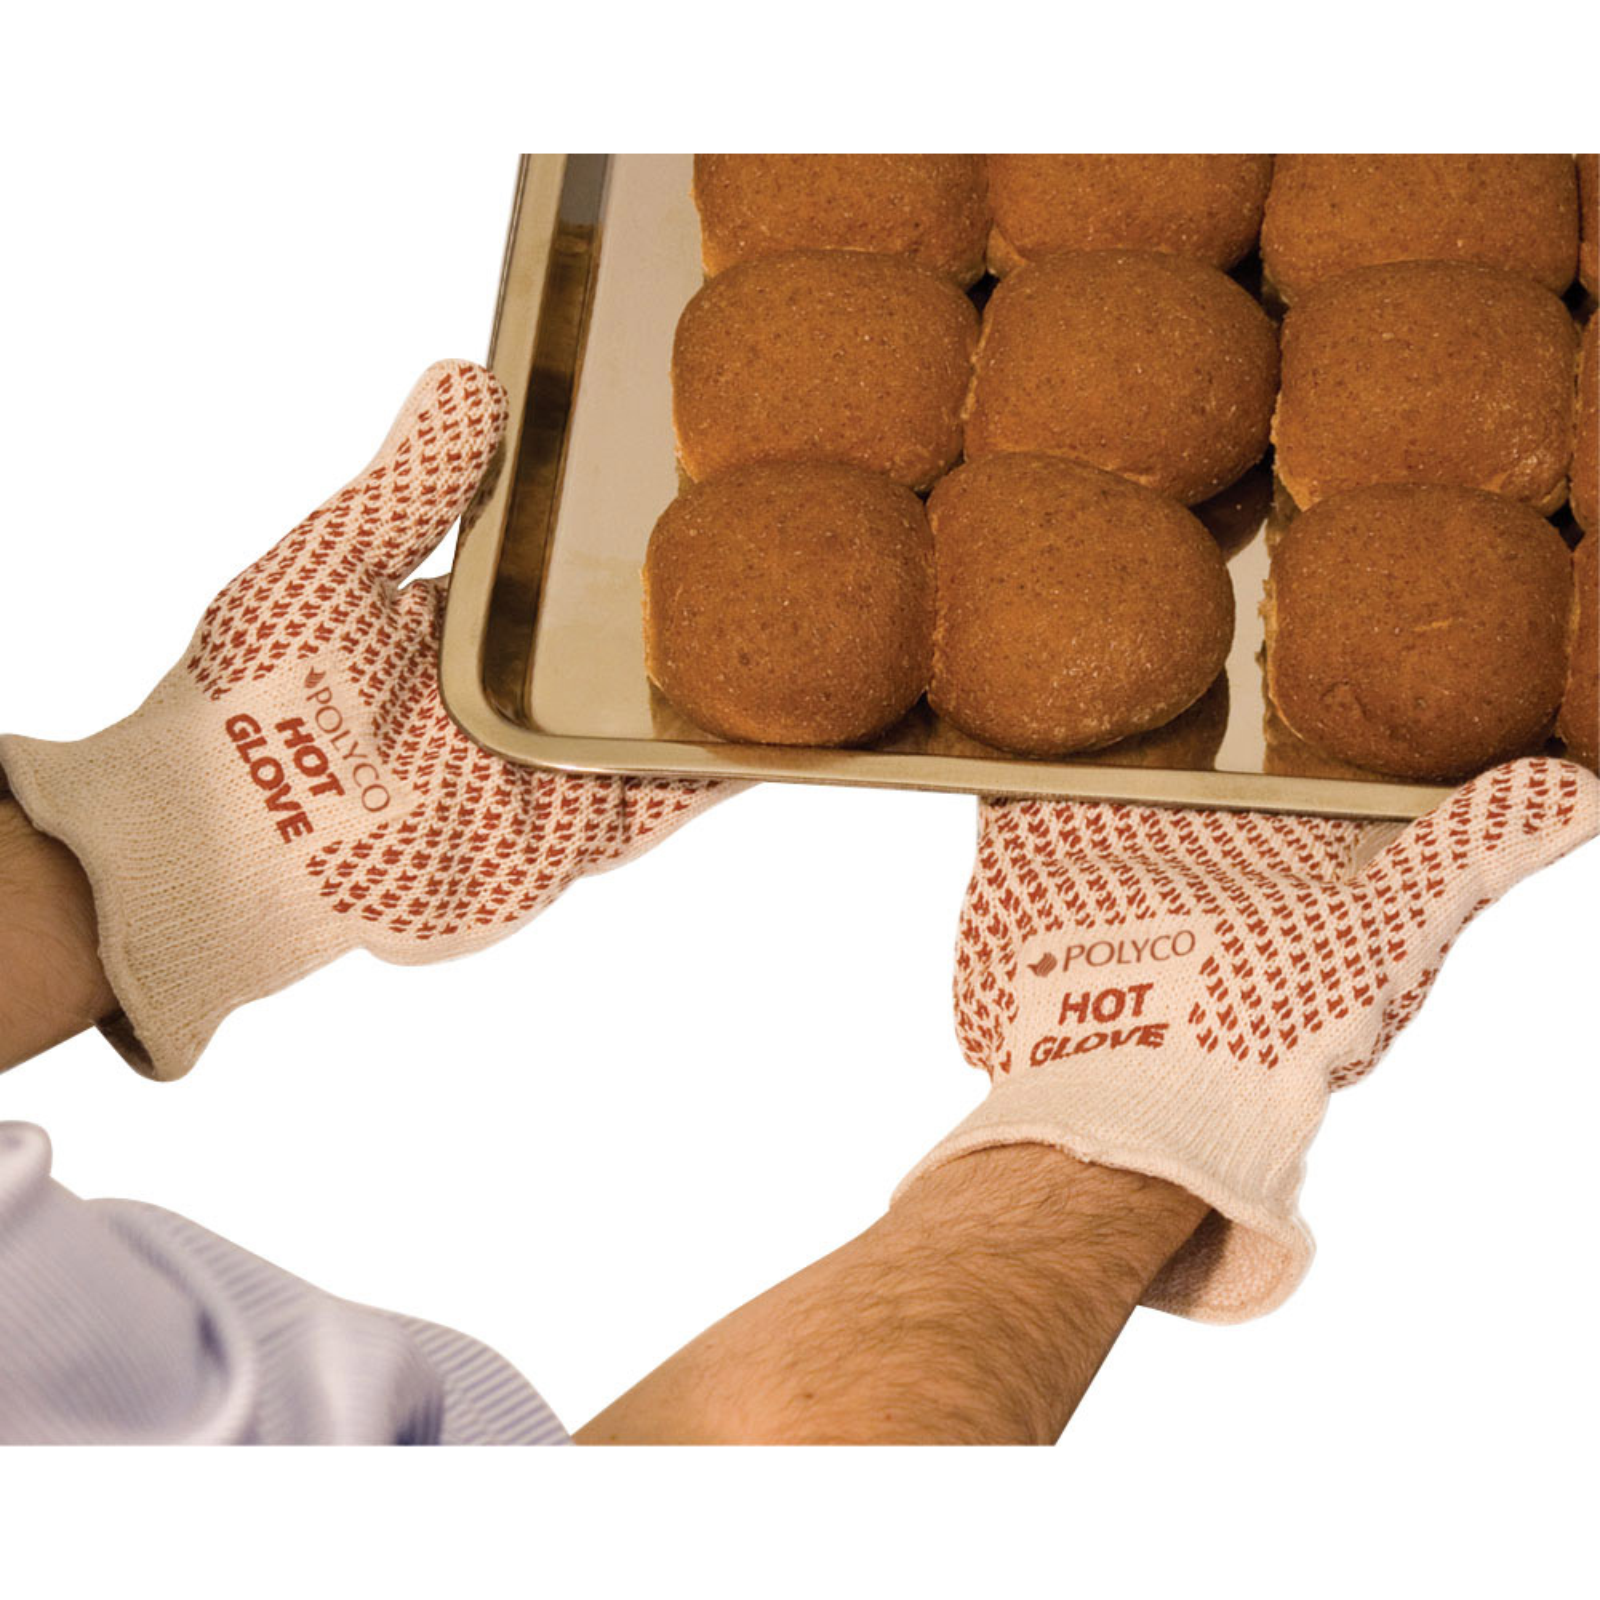 Hot Gloves™